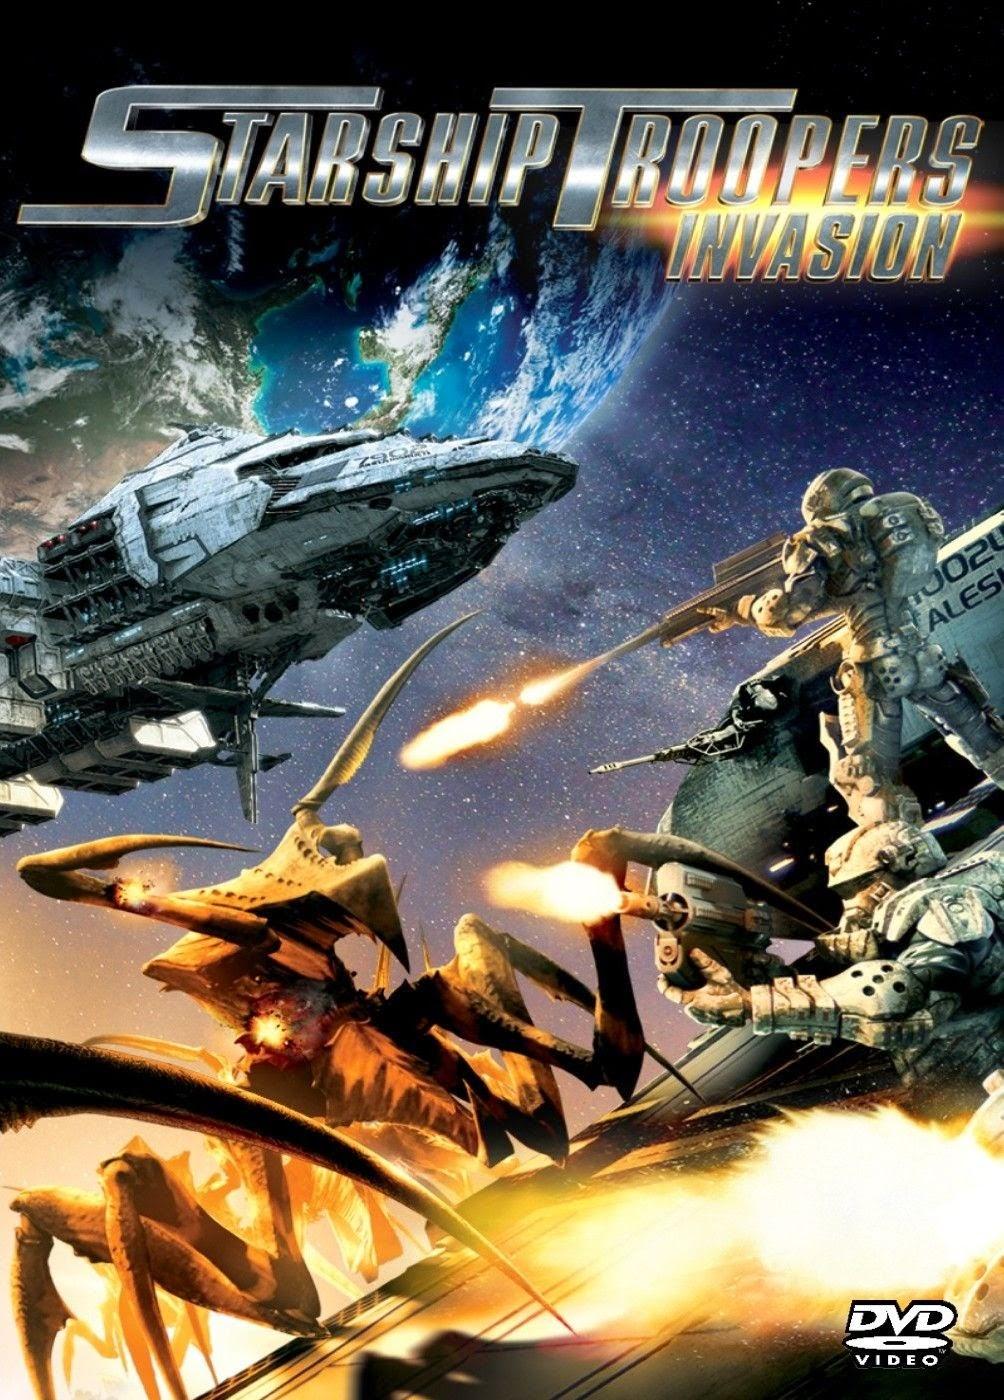 http://superheroesrevelados.blogspot.com.ar/2013/02/starship-troopers-invasion.html